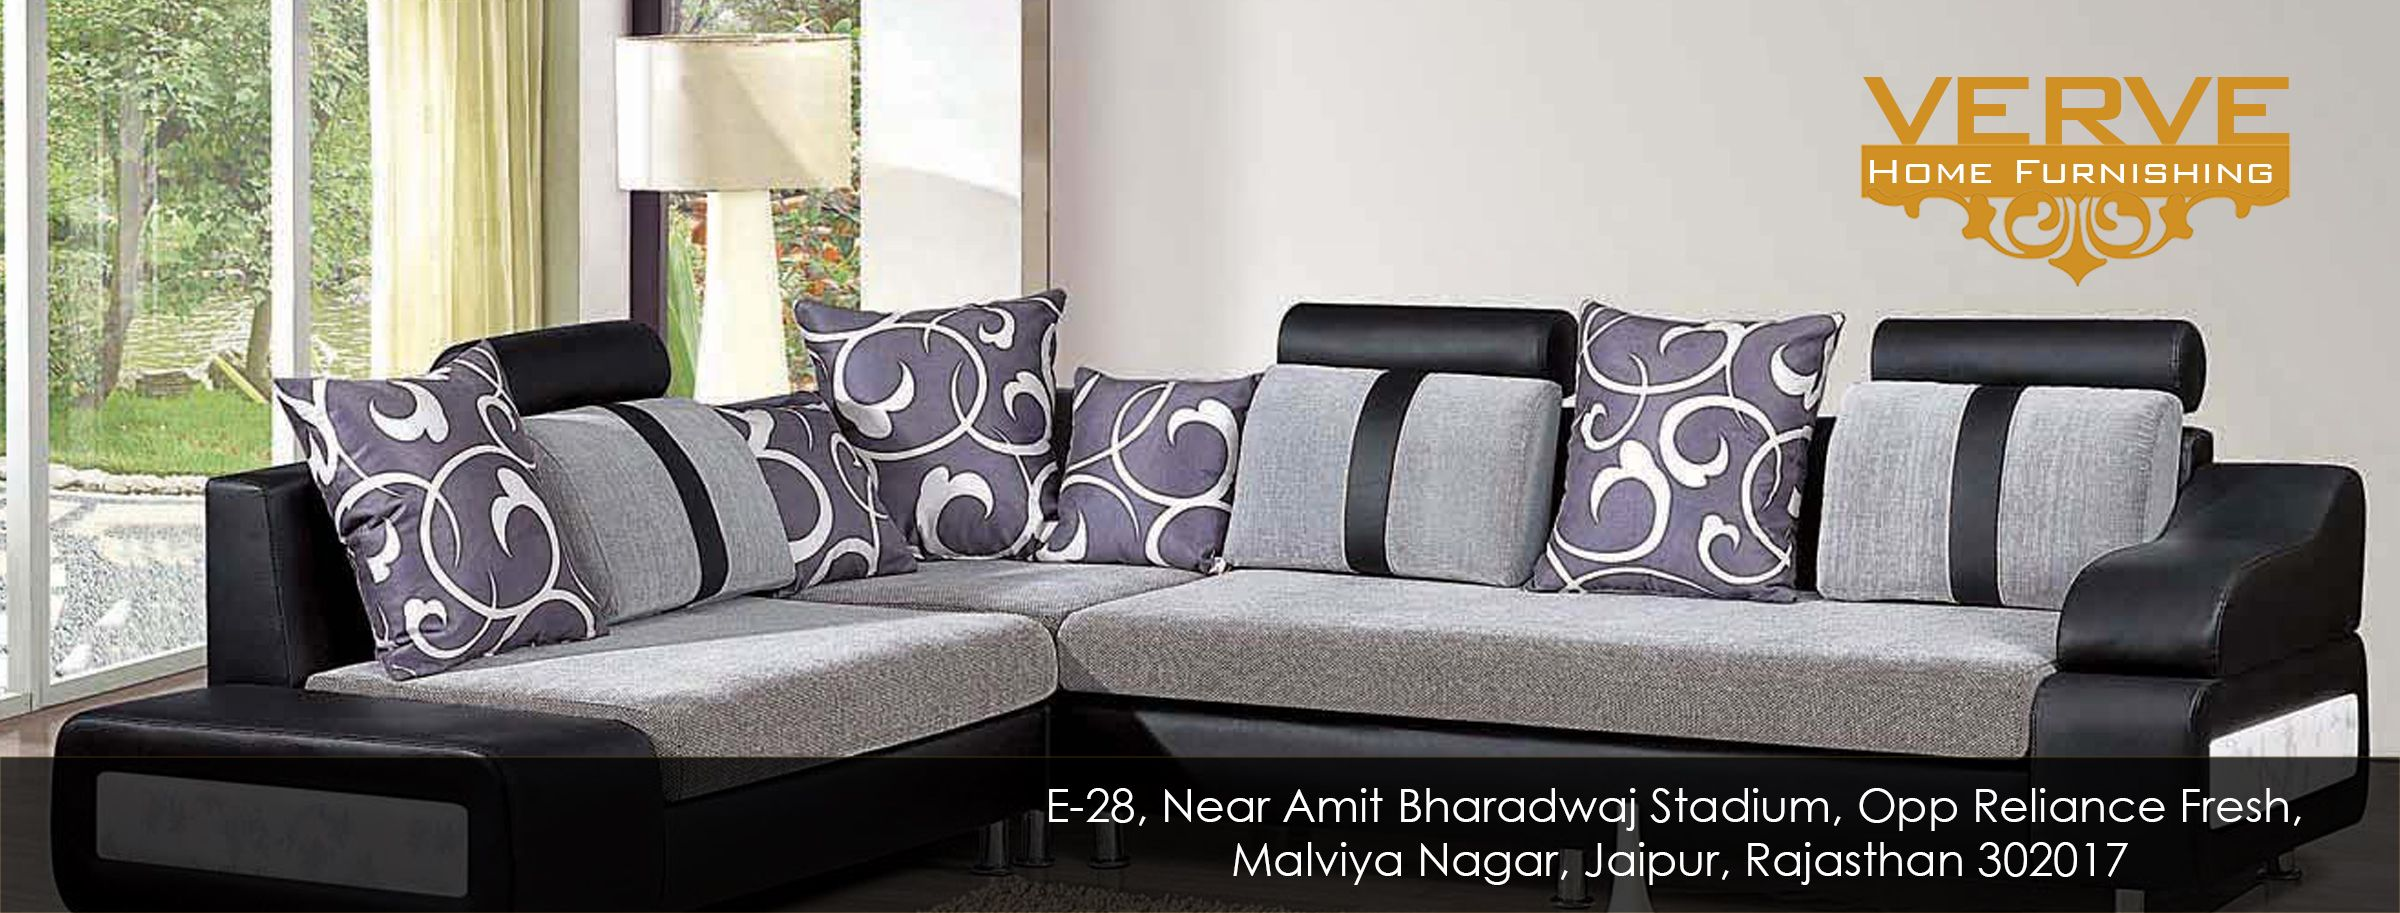 Pin By Verve Furnishings On Home Decor Living Room Sofa Design Living Room Sofa Set